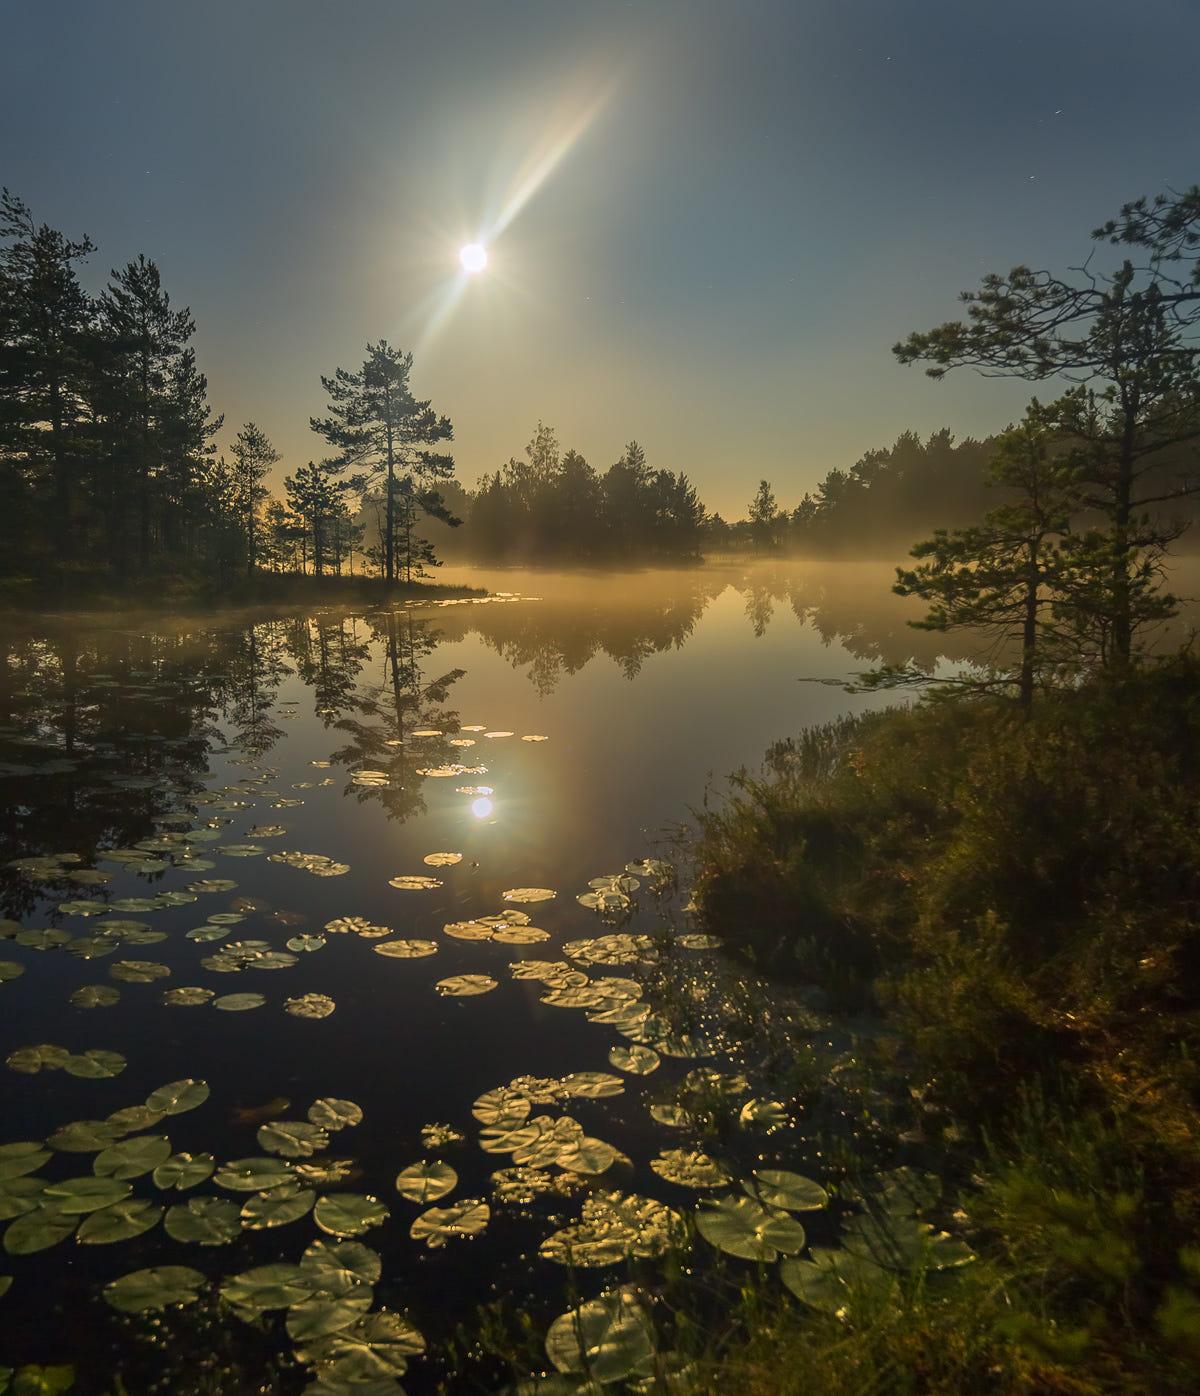 Озеро акраш башкирия фото доме